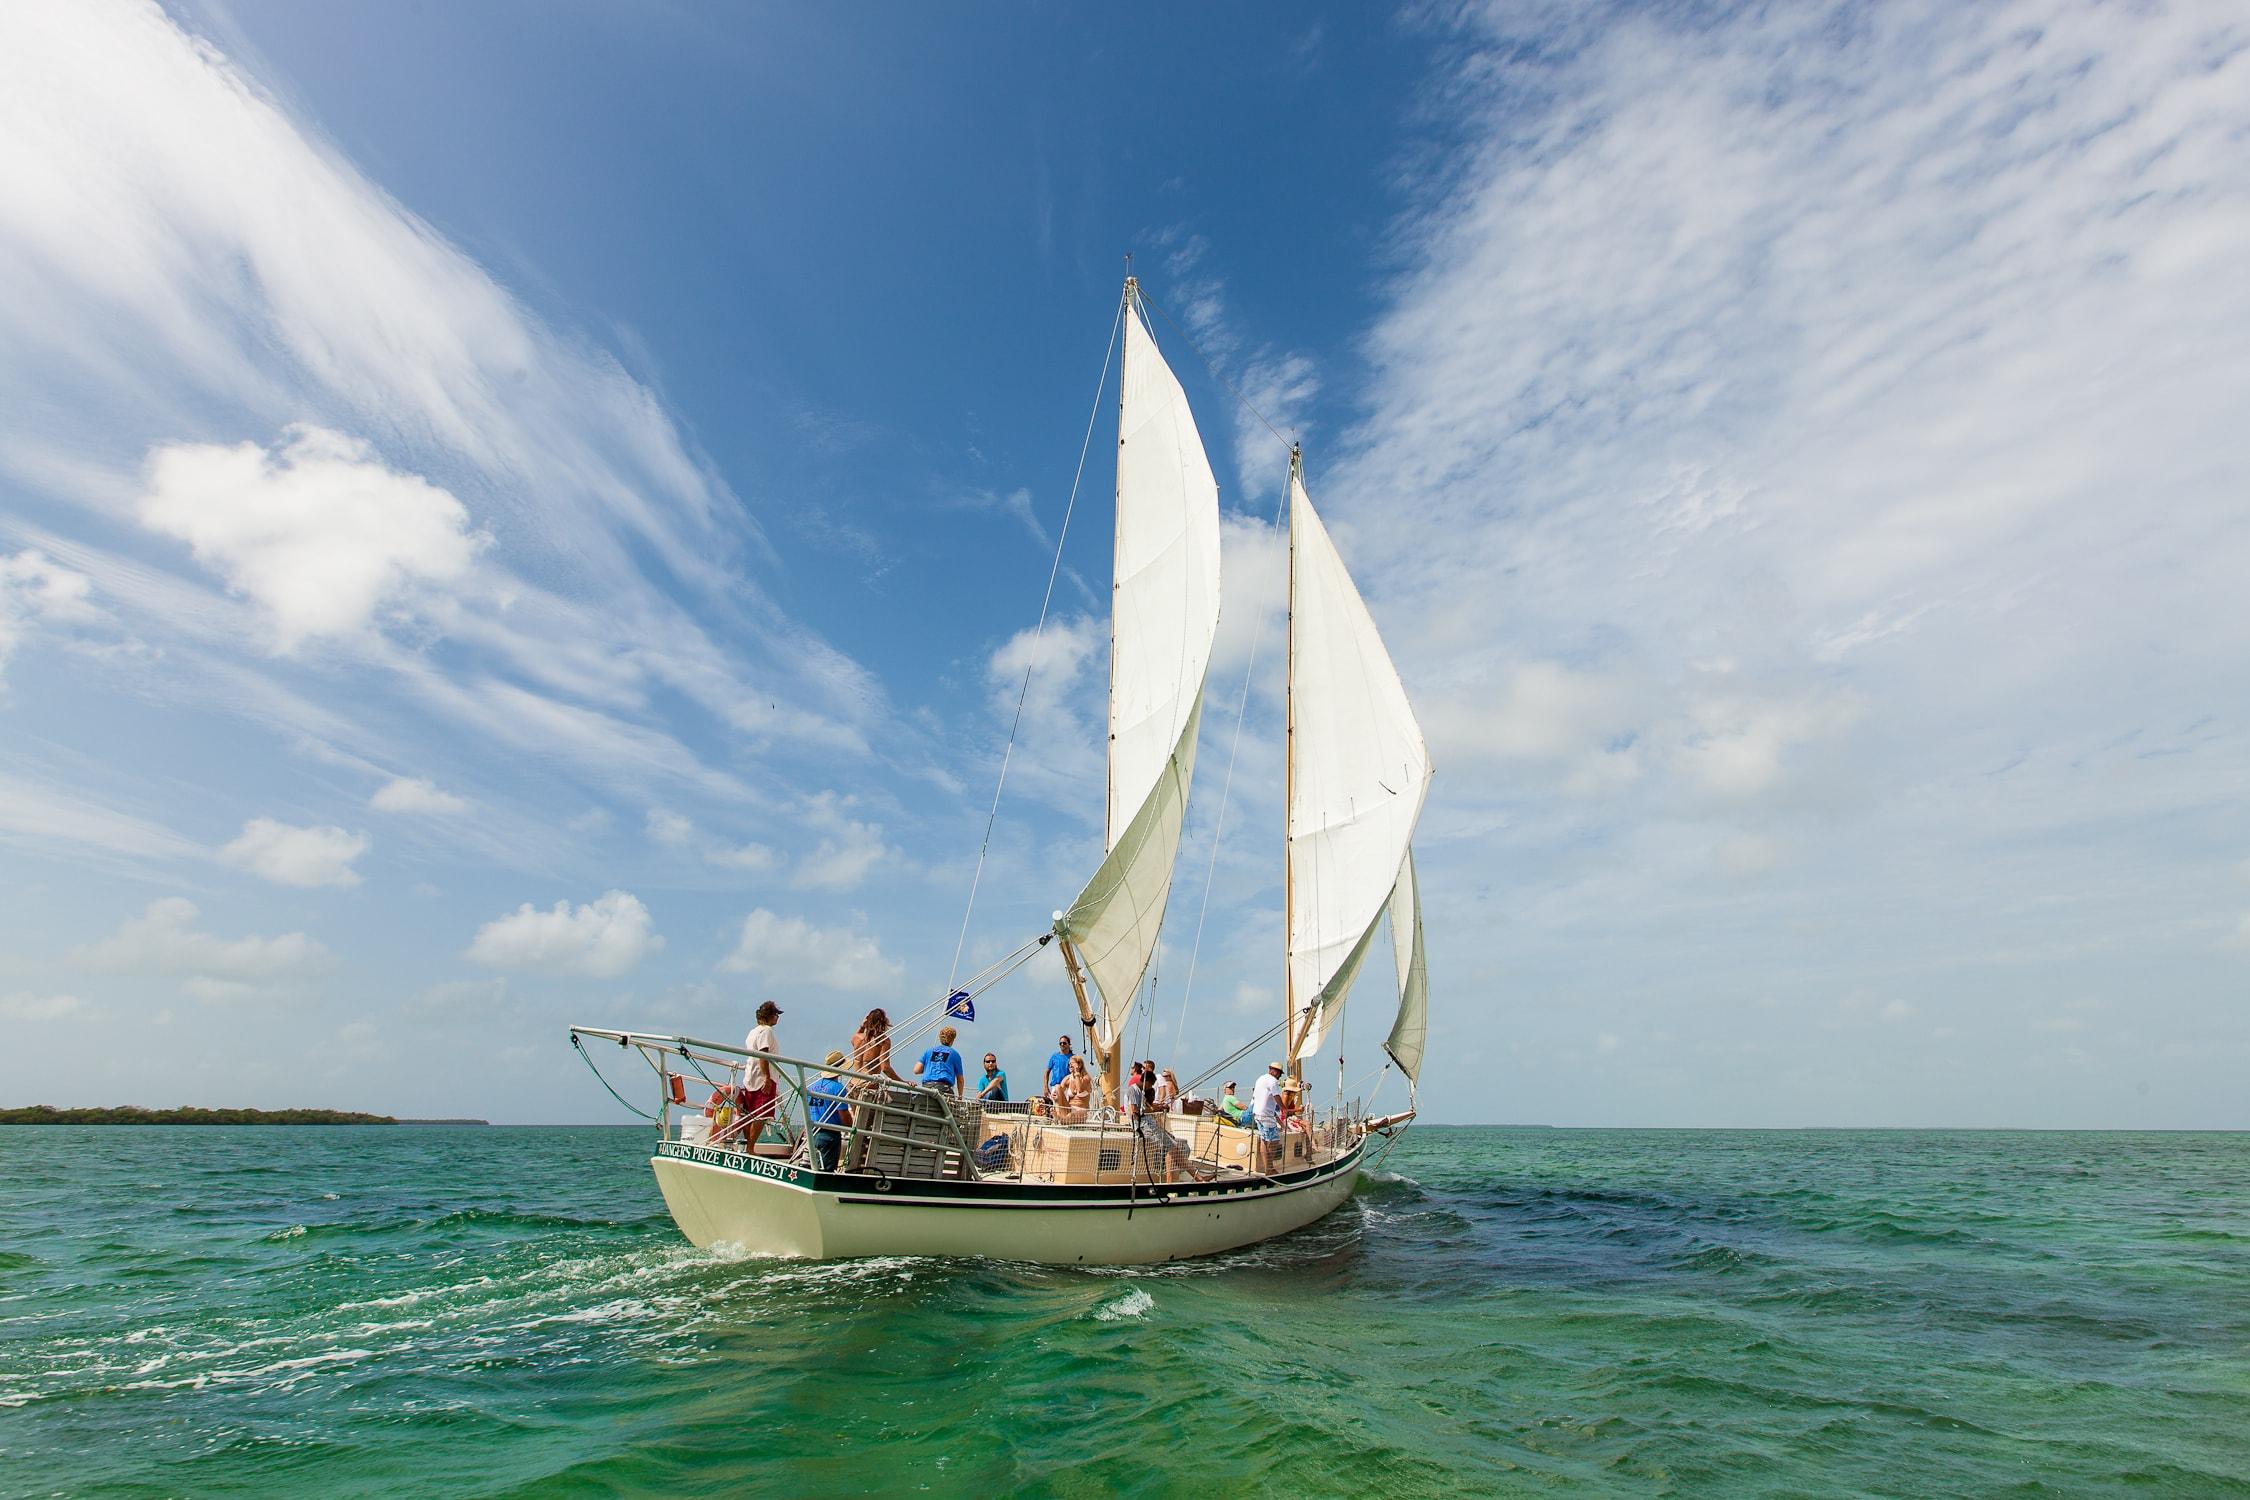 Key West Sail, Snorkel, Kayak With Sunset Option 2020